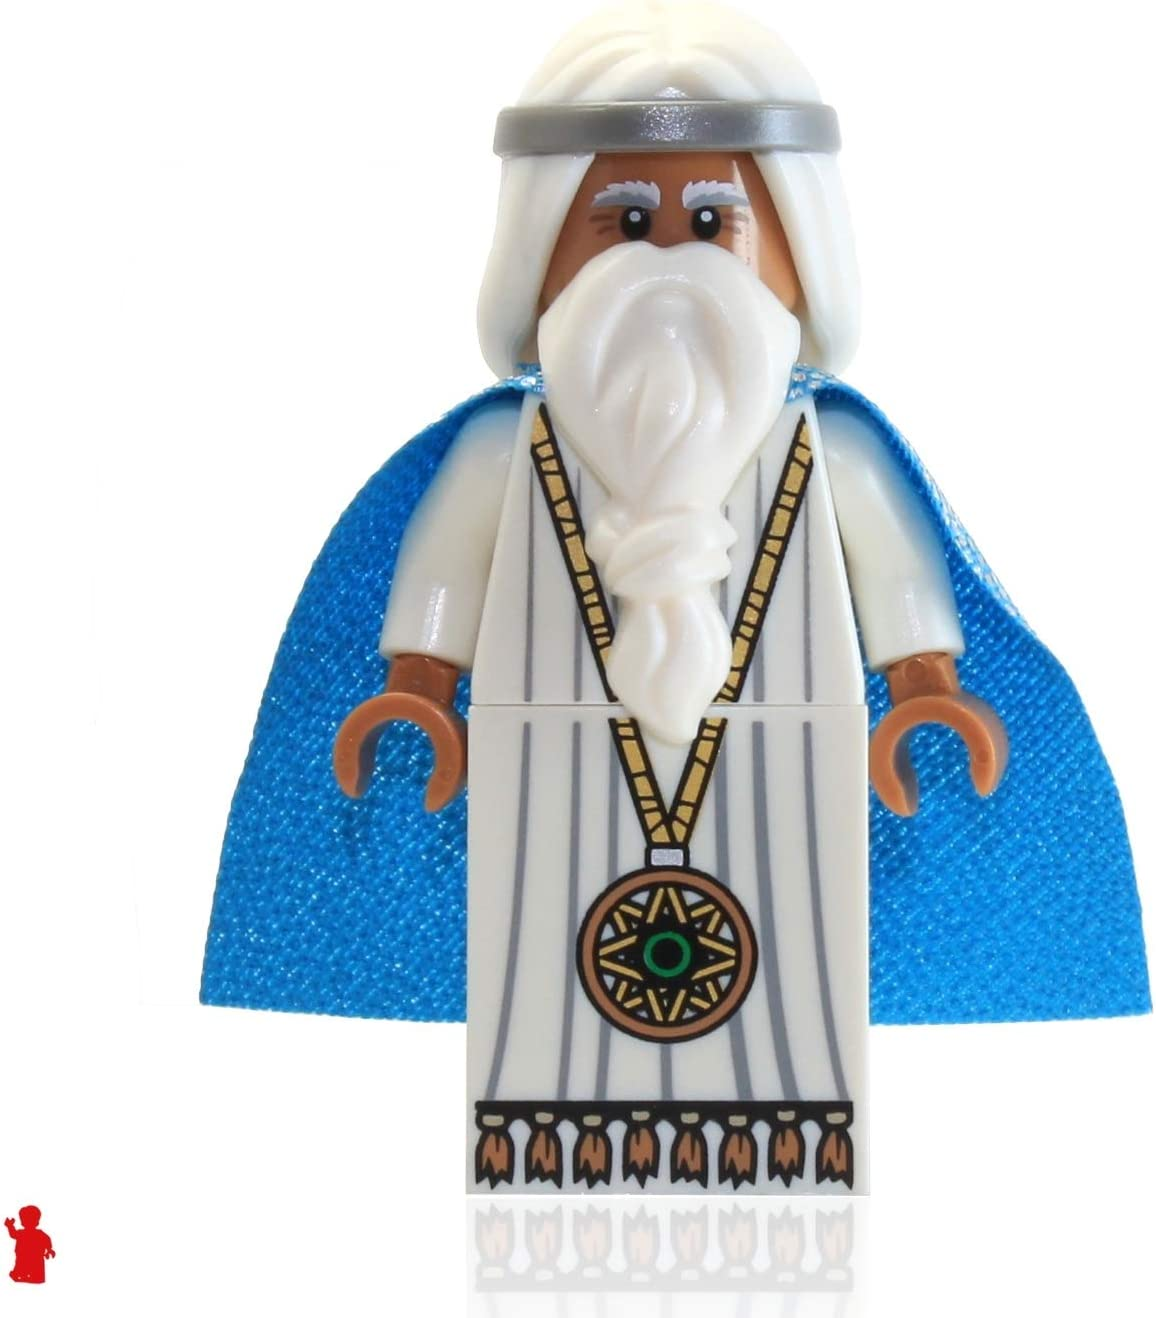 LEGO The Movie Vitruvius Minifigure [Loose]